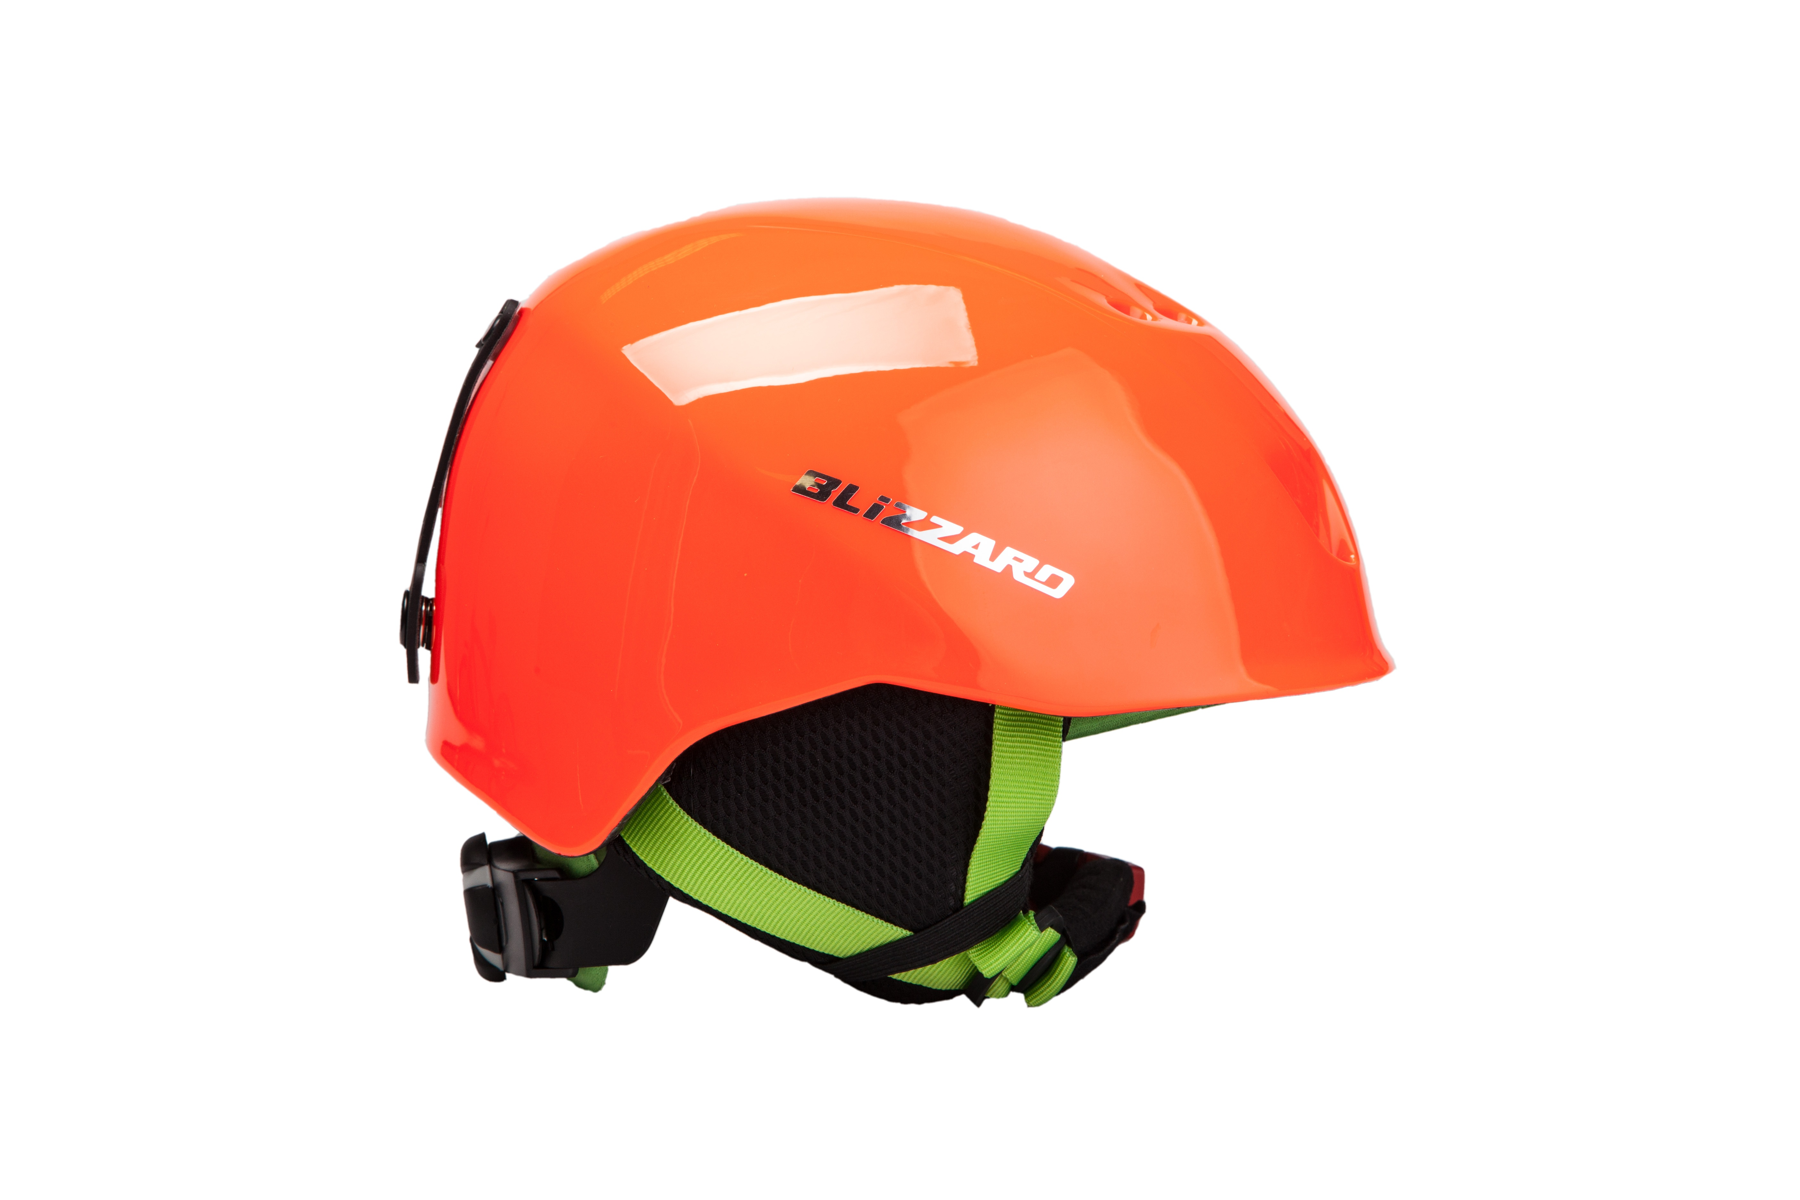 SIGNAL ski helmet, orange